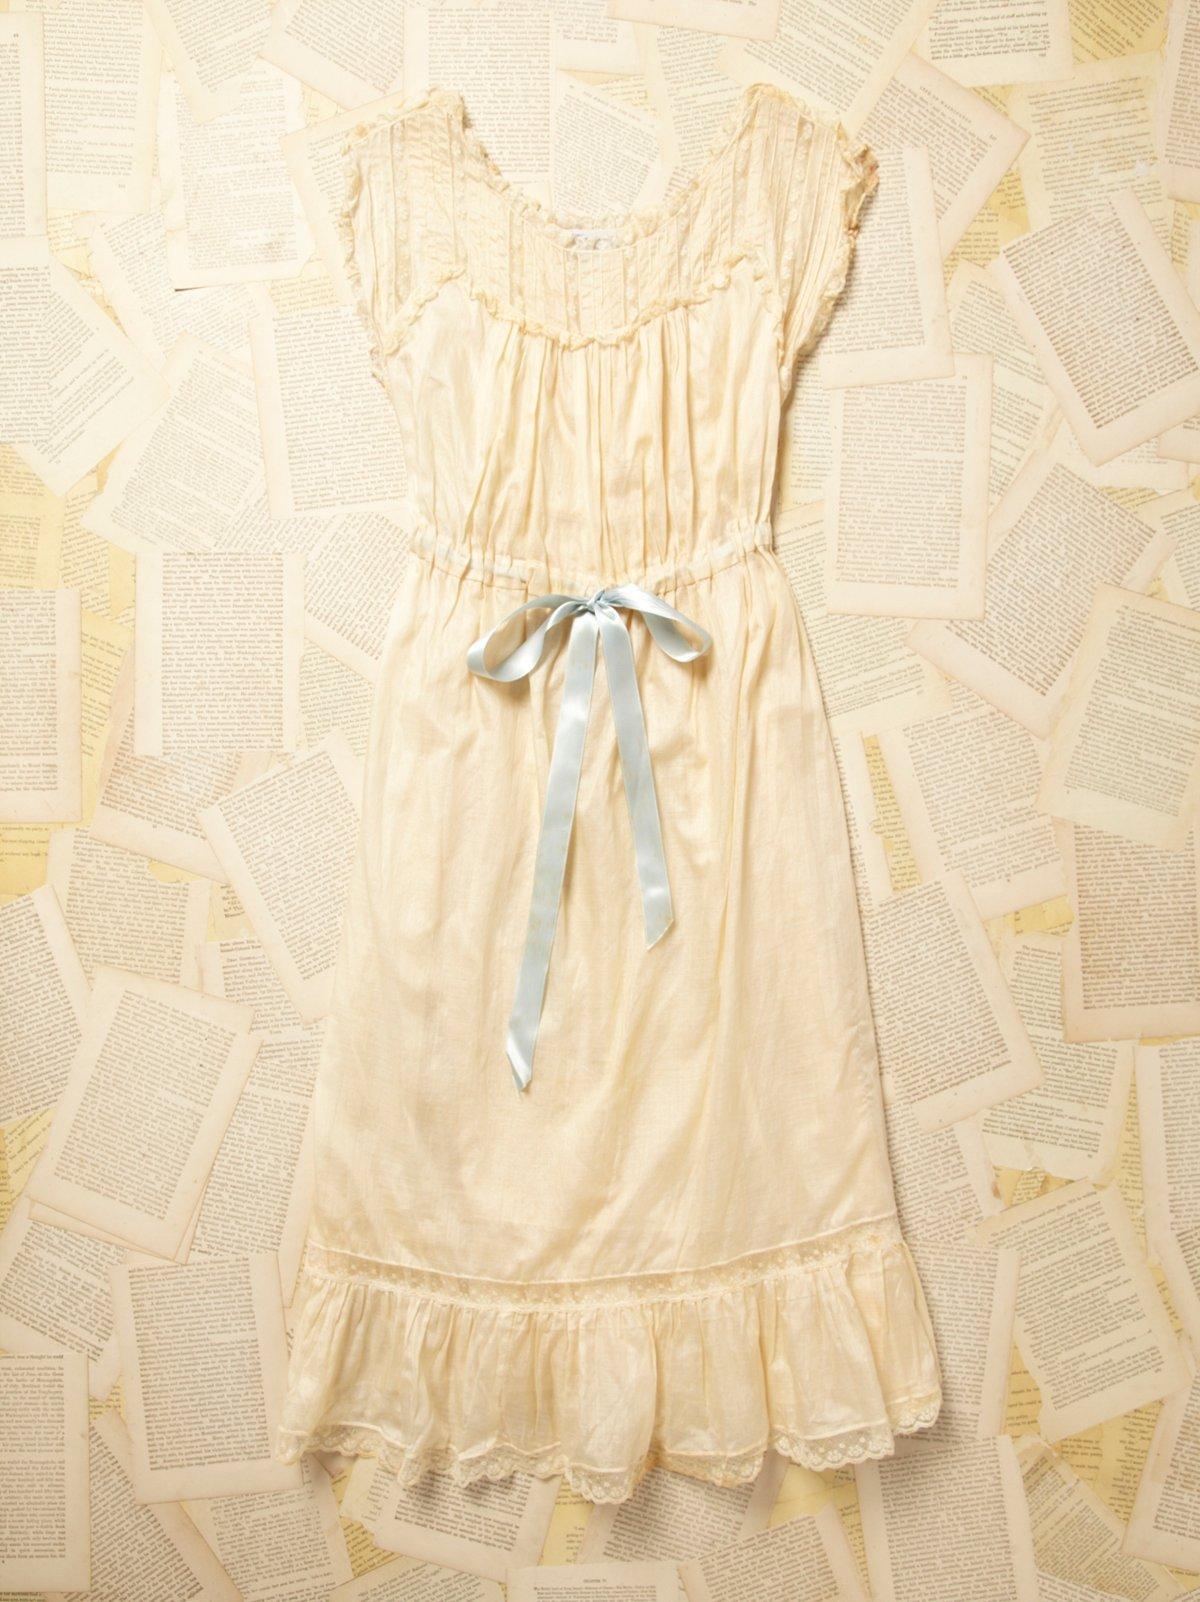 Vintage 1930s Lace and Cotton Dress